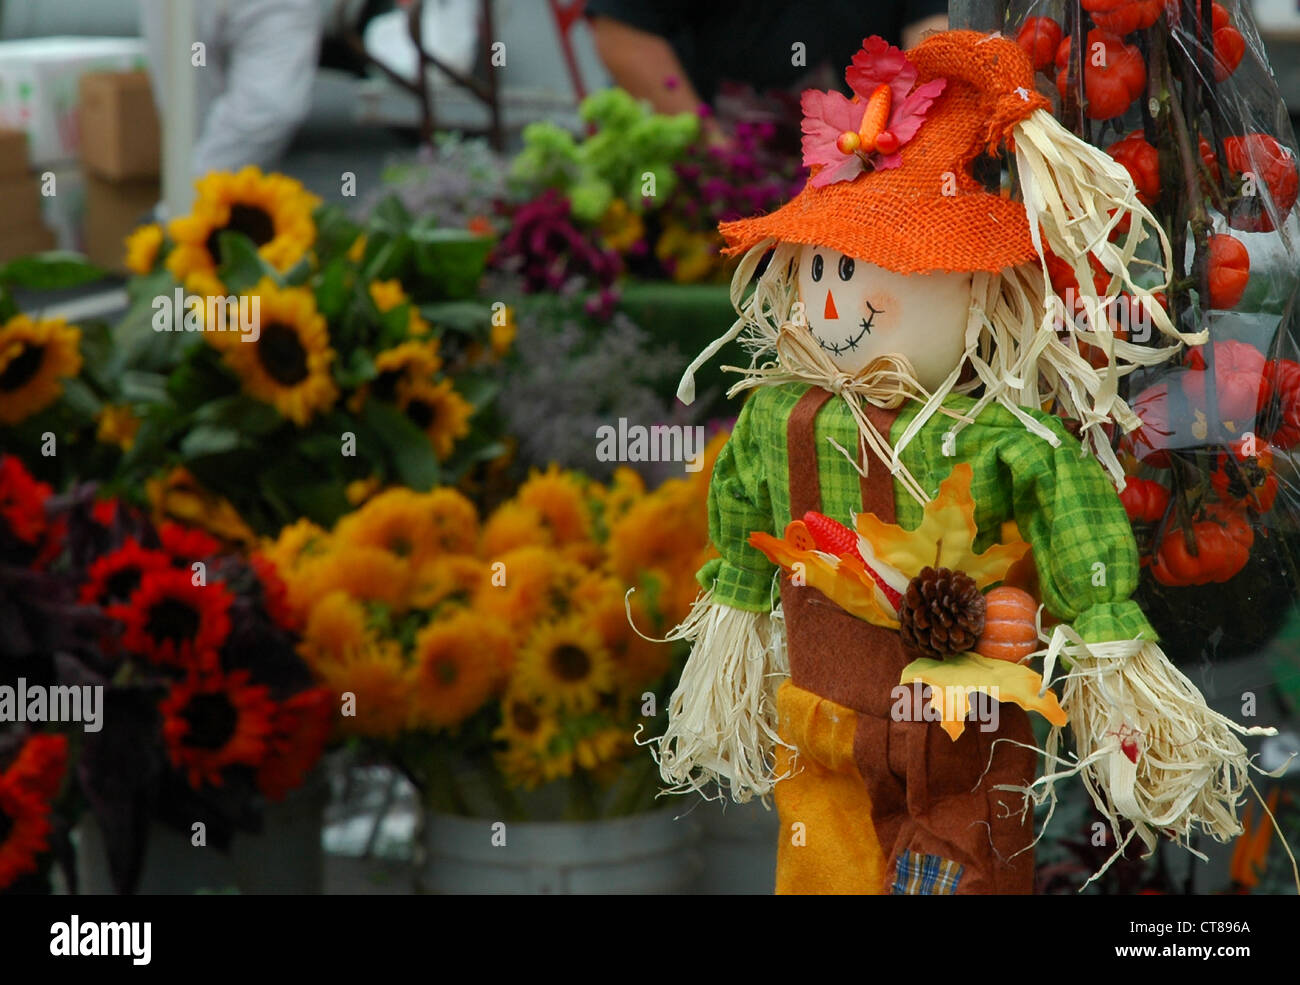 Farmers Market Scarecrow & SunflowersStock Photo